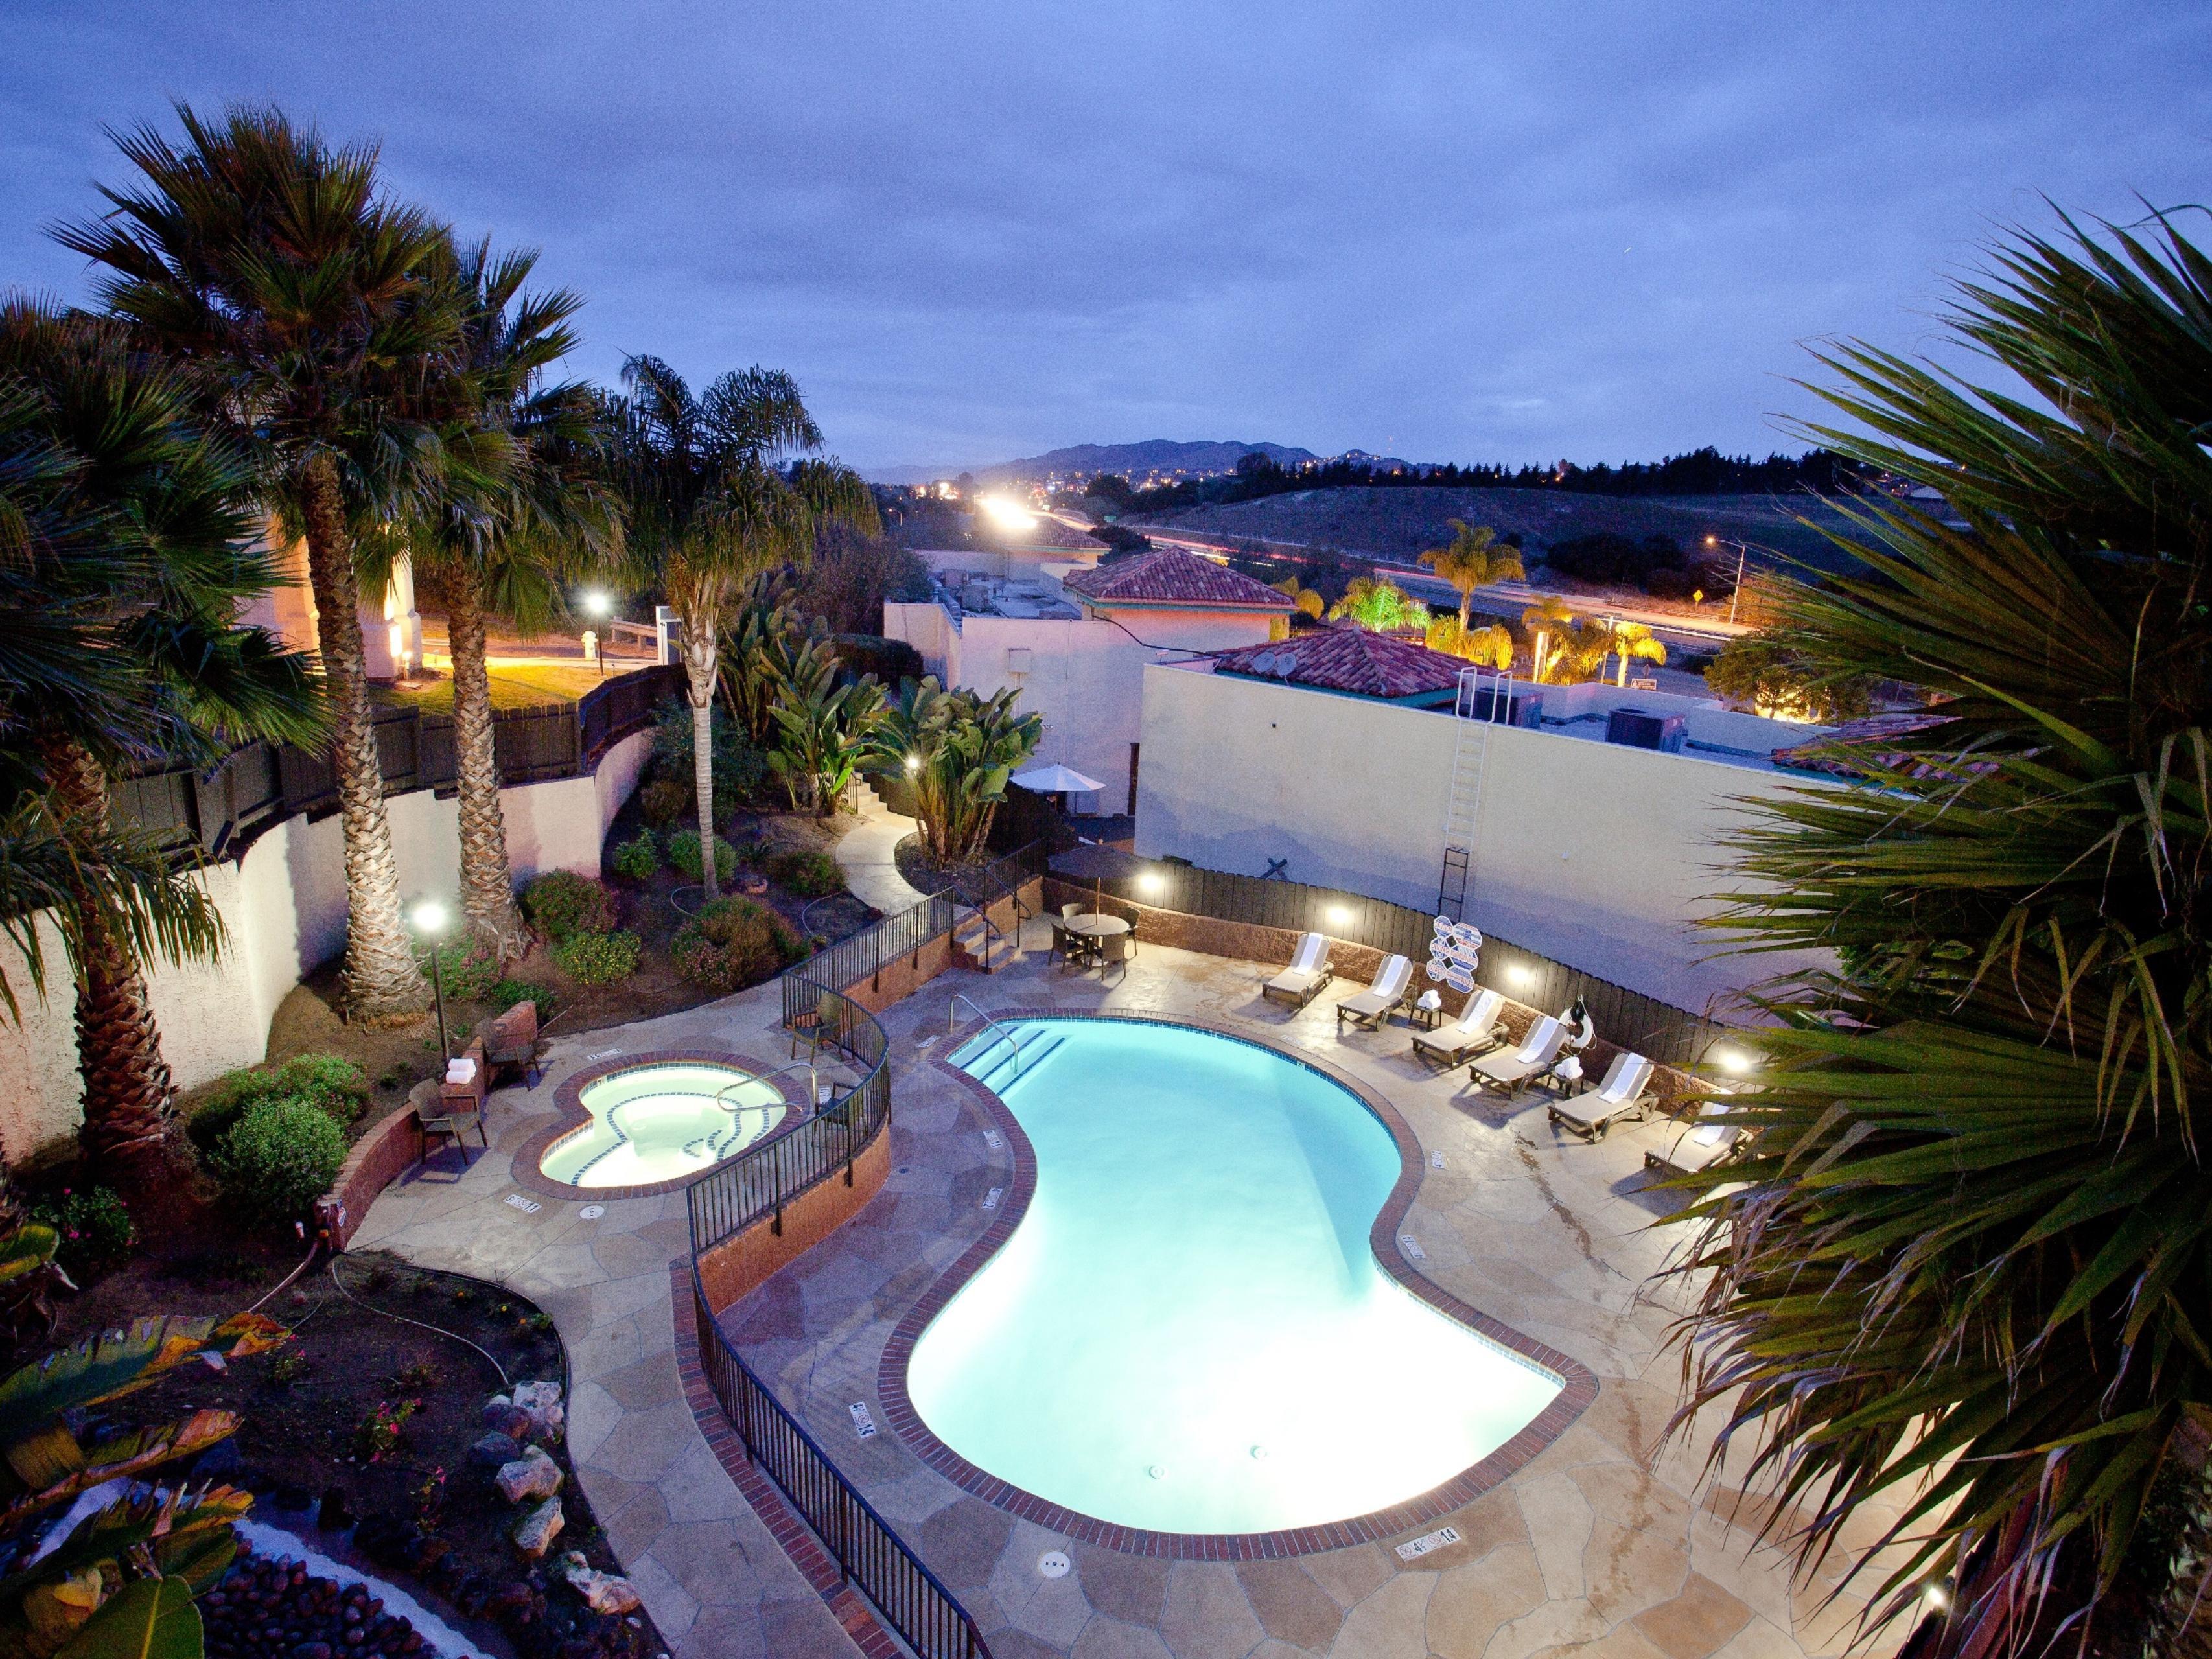 Holiday Inn Express Grover Beach Pismo Beach Area Hotel By IHG